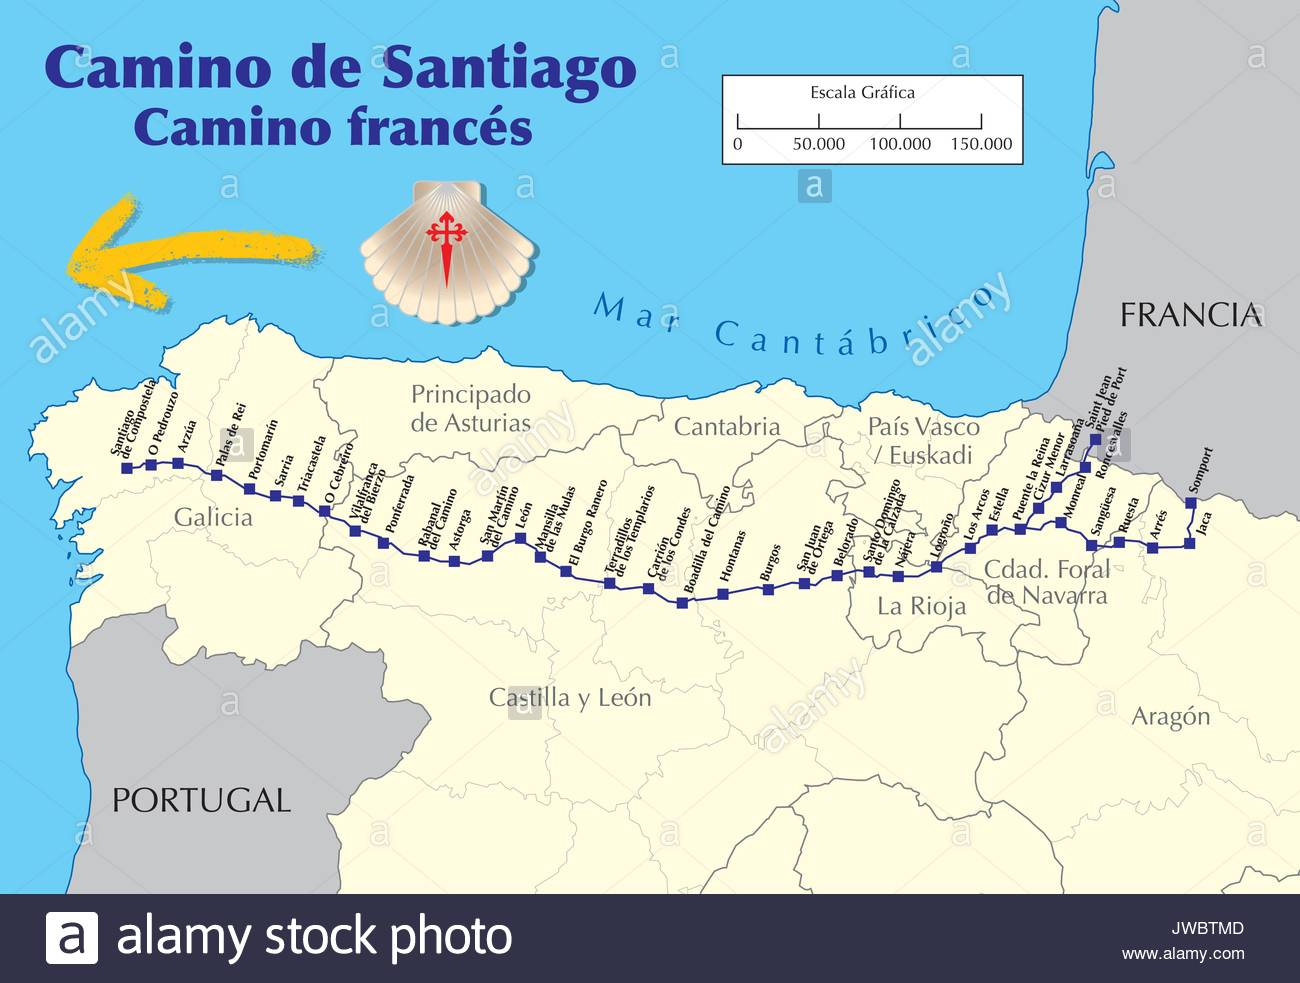 Camino De Santiago Mapa Etapas.Mapa Del Camino De Santiago Mapa Del Camino De Santiago De